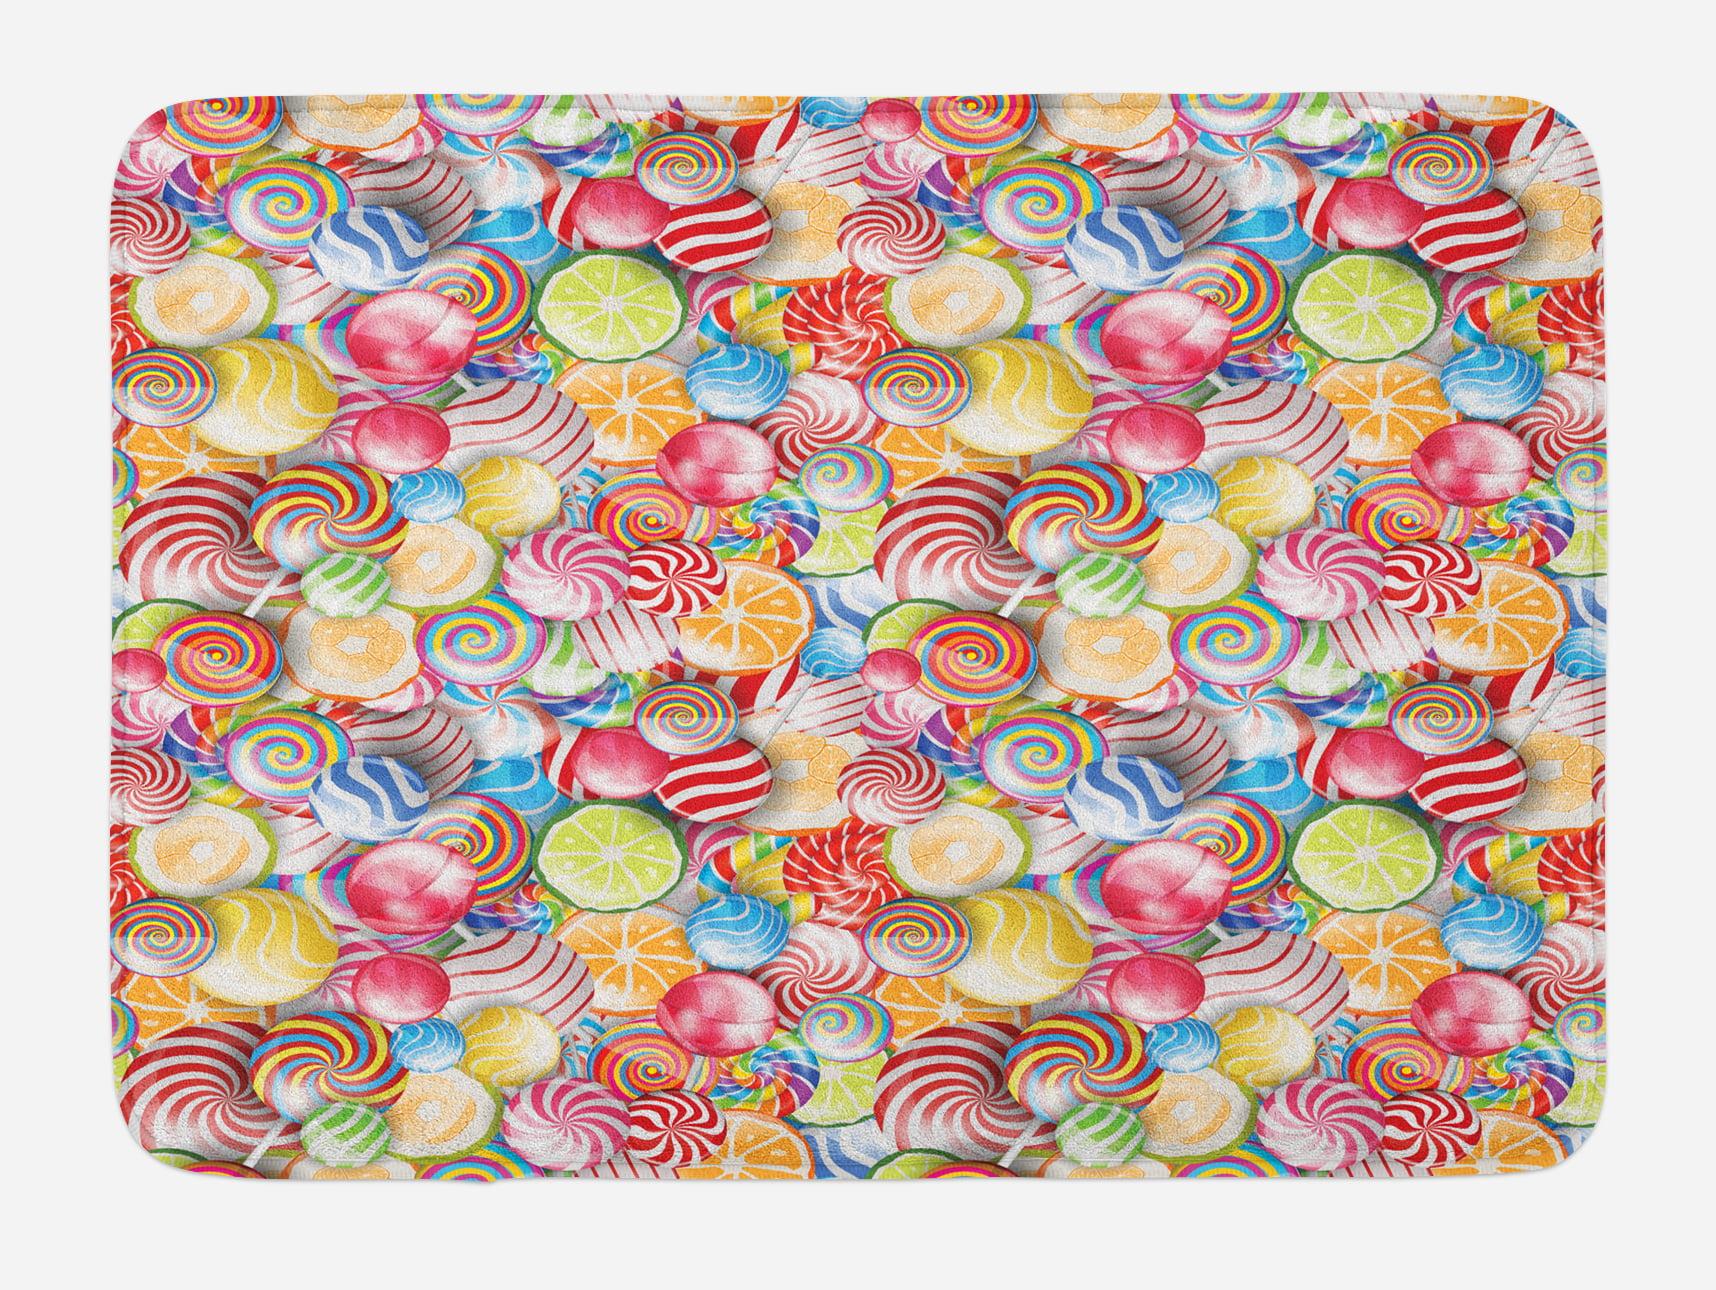 Colorful Bath Mat, Spiral Sugar Candy Sweets Lolly Pops Dessert Fun Girls Kids Nursery... by 3decor llc